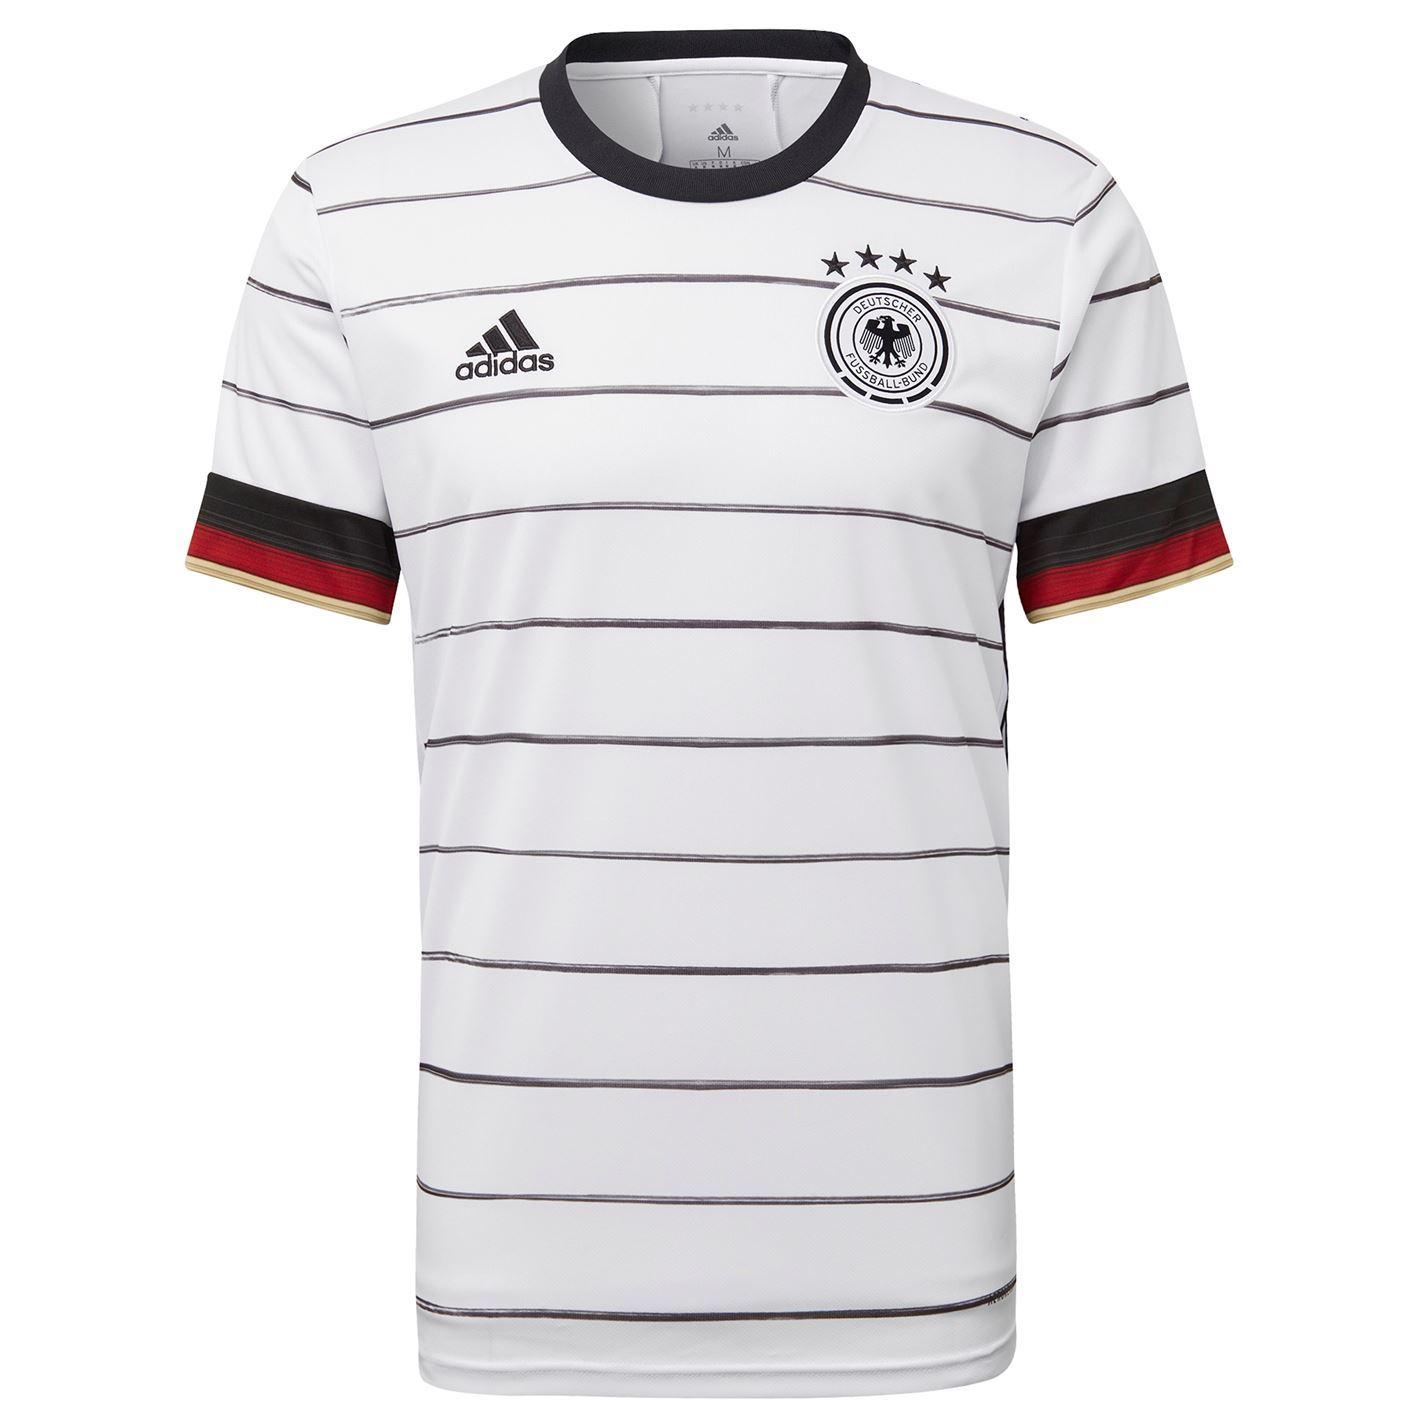 Detalles de Adidas Alemania Home Camisa 2020 Hombres Blanco Fútbol Camiseta Camiseta